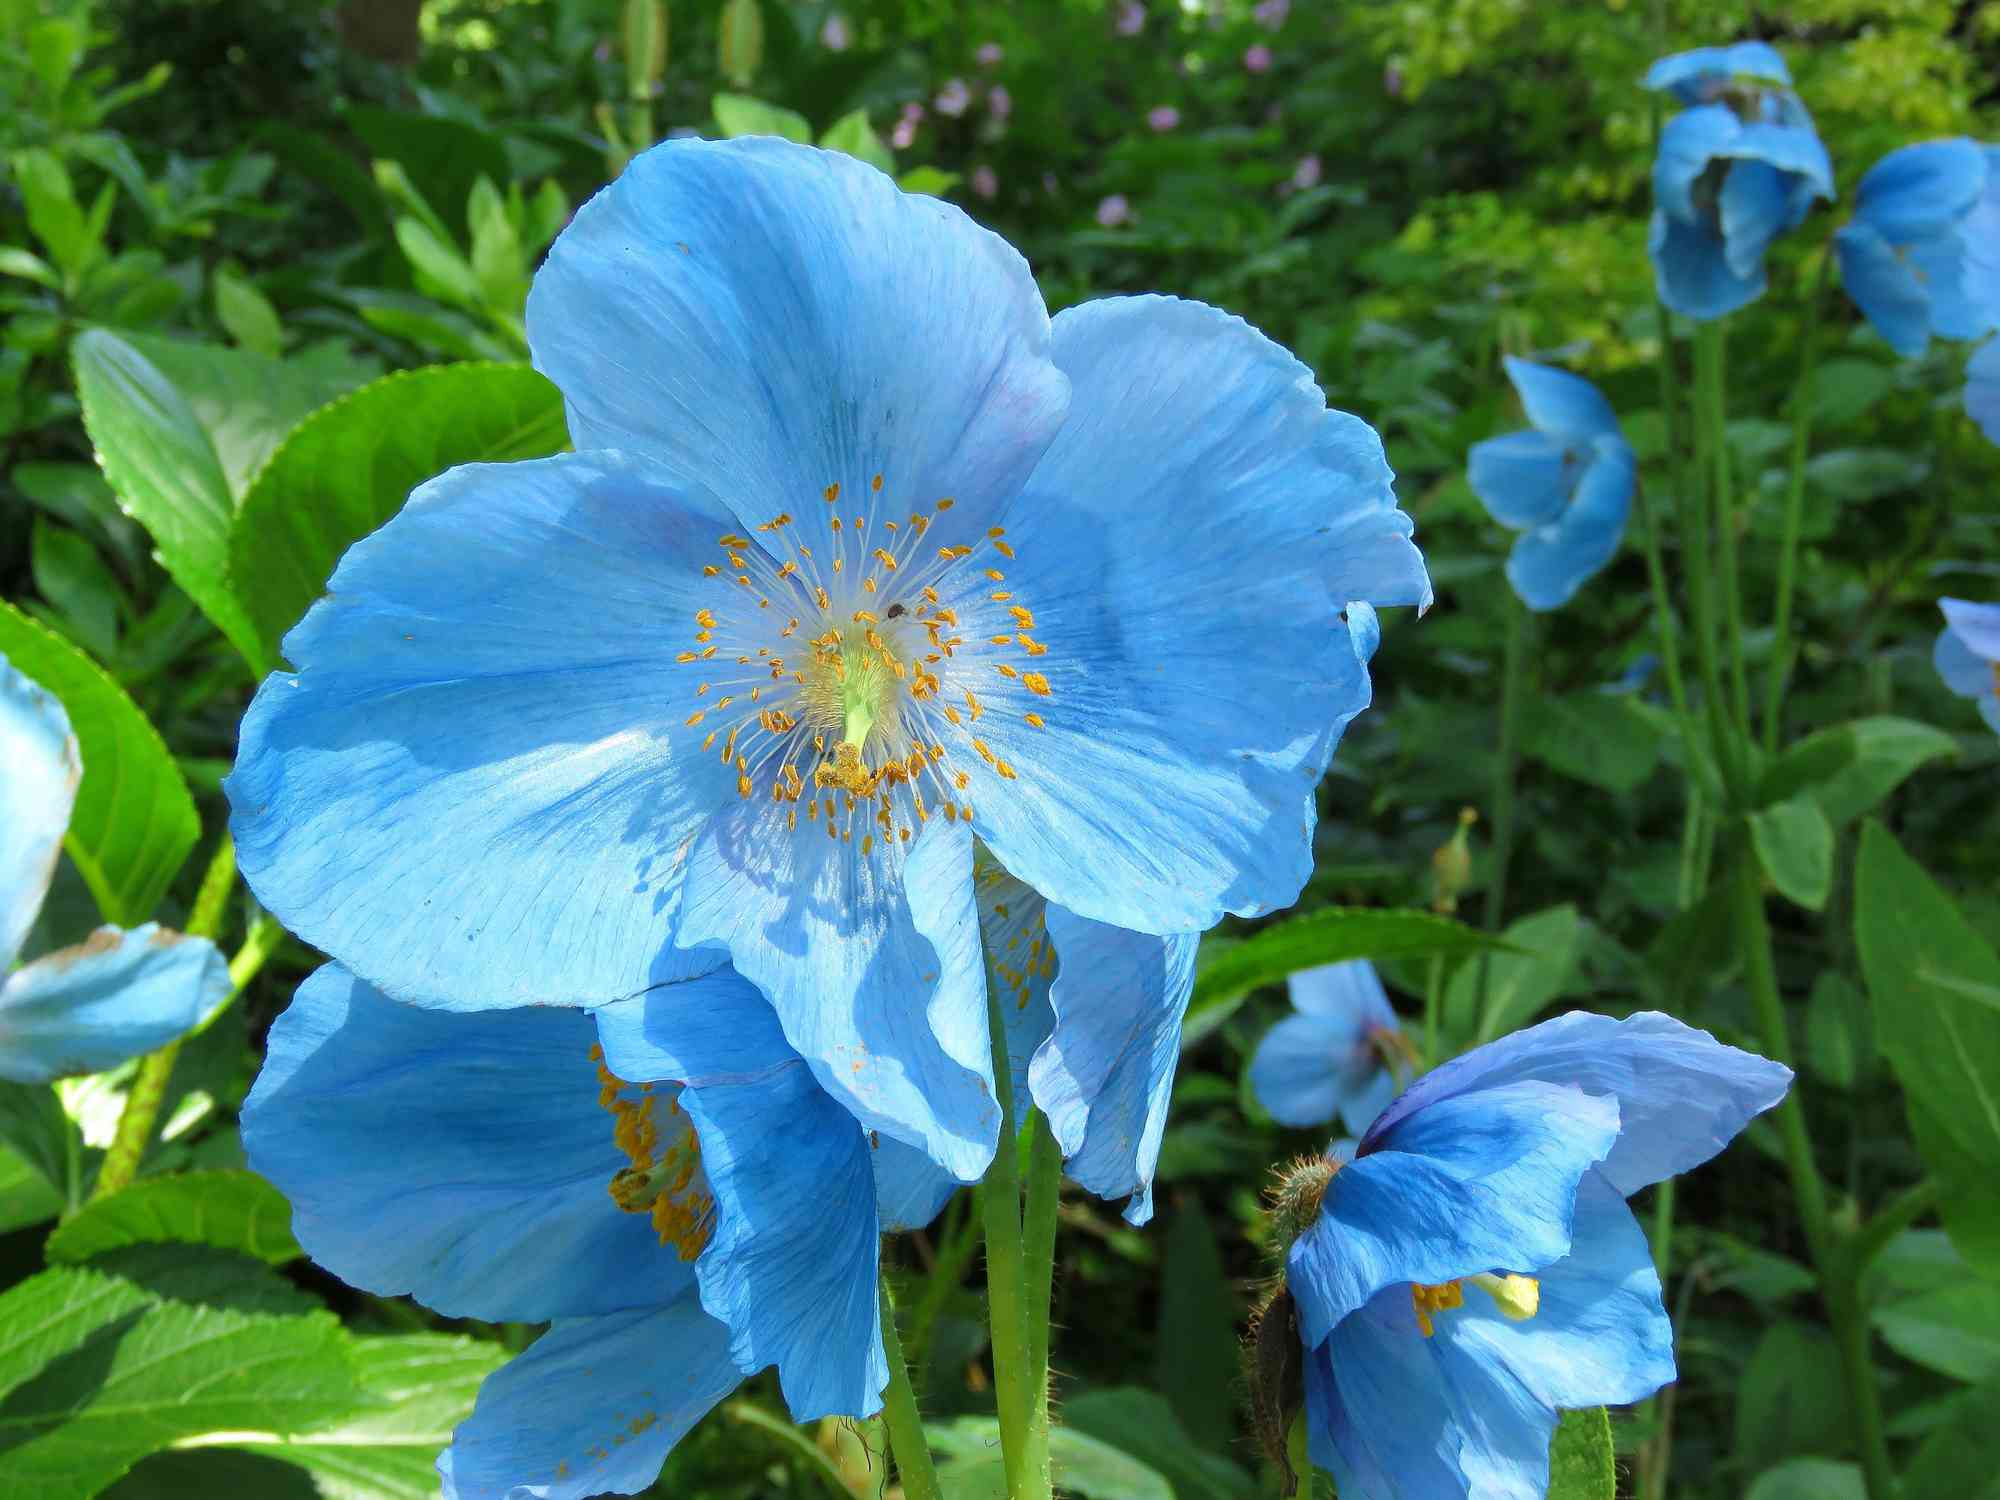 12 beautiful blue flowering plants for the garden tibetan blue poppy meconopsis izmirmasajfo